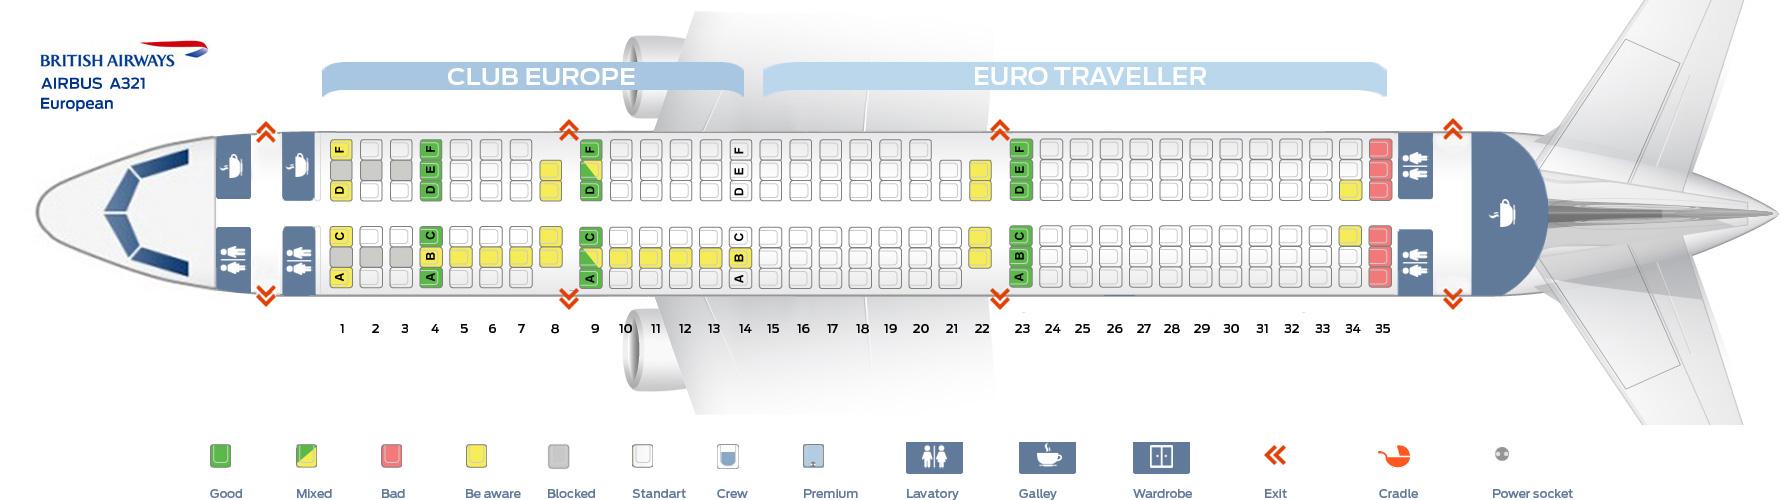 Seat_map_British_Airways_Airbus_A321_European